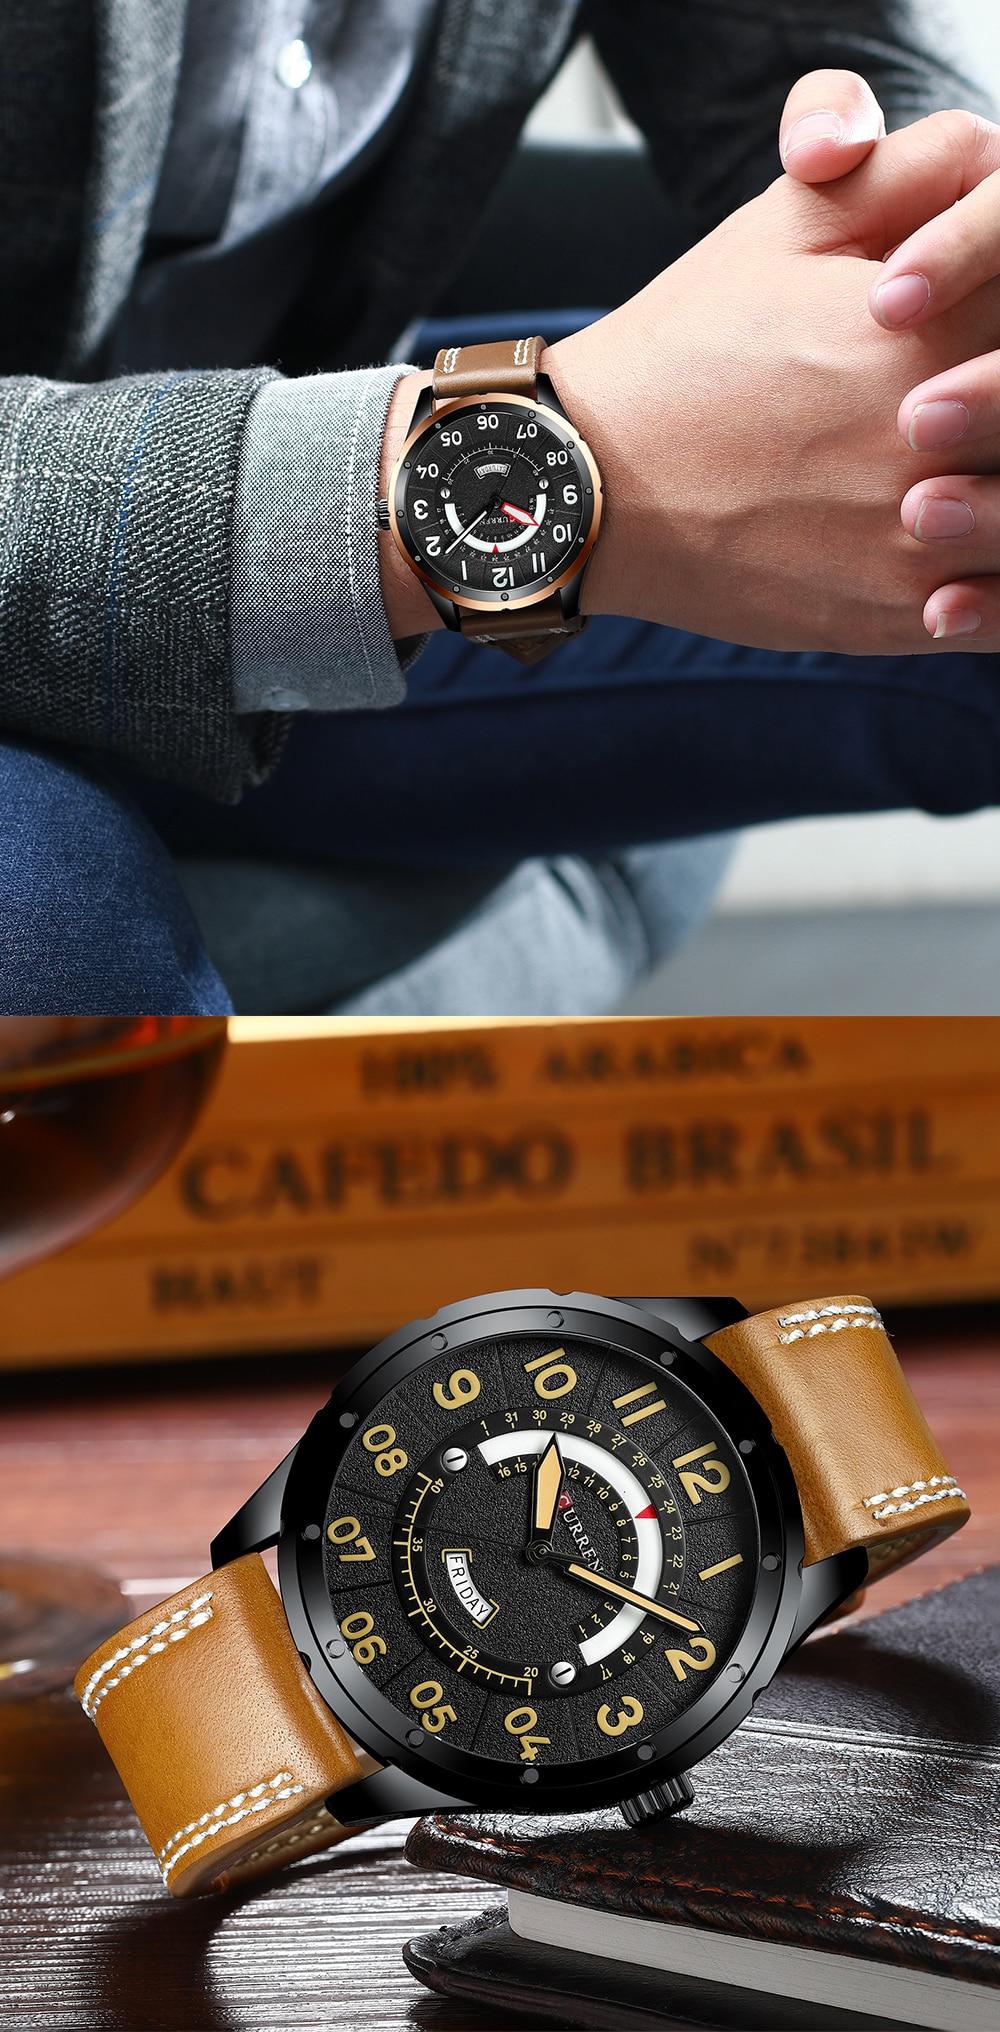 HTB1dYBsaEH1gK0jSZSyq6xtlpXab CURREN Date Mens Watches Luxury Sport Watch